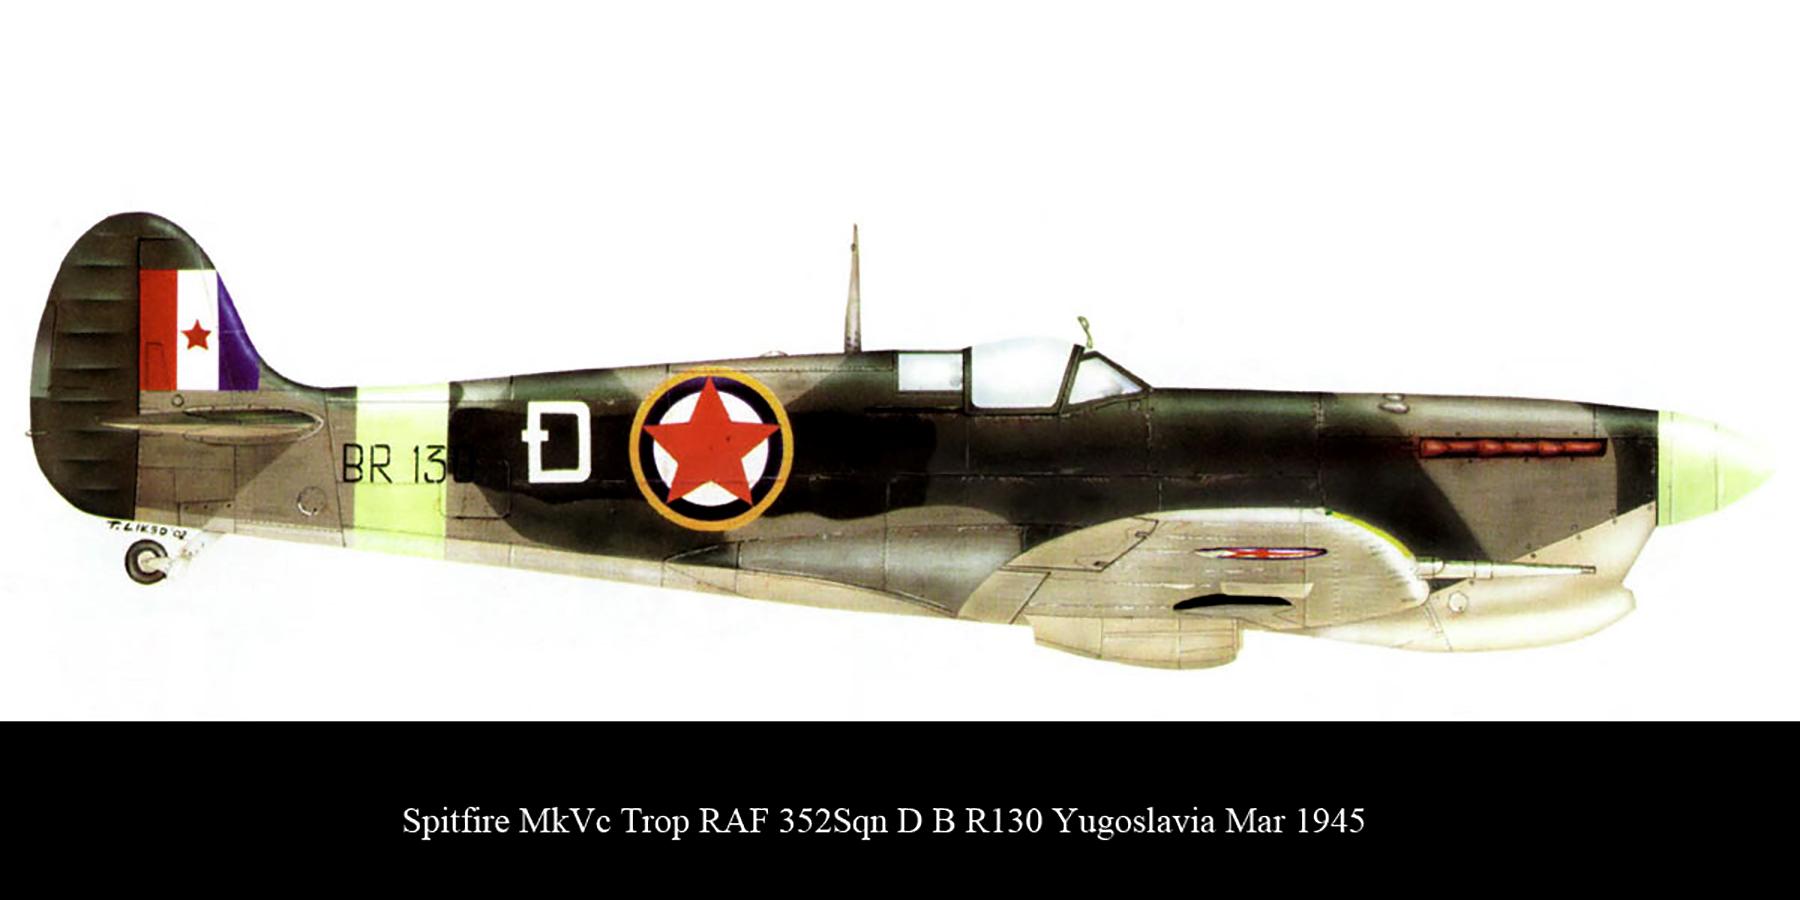 Spitfire MkVcTrop RAF 352Sqn D BR130 Yugoslavia Mar 1945 00